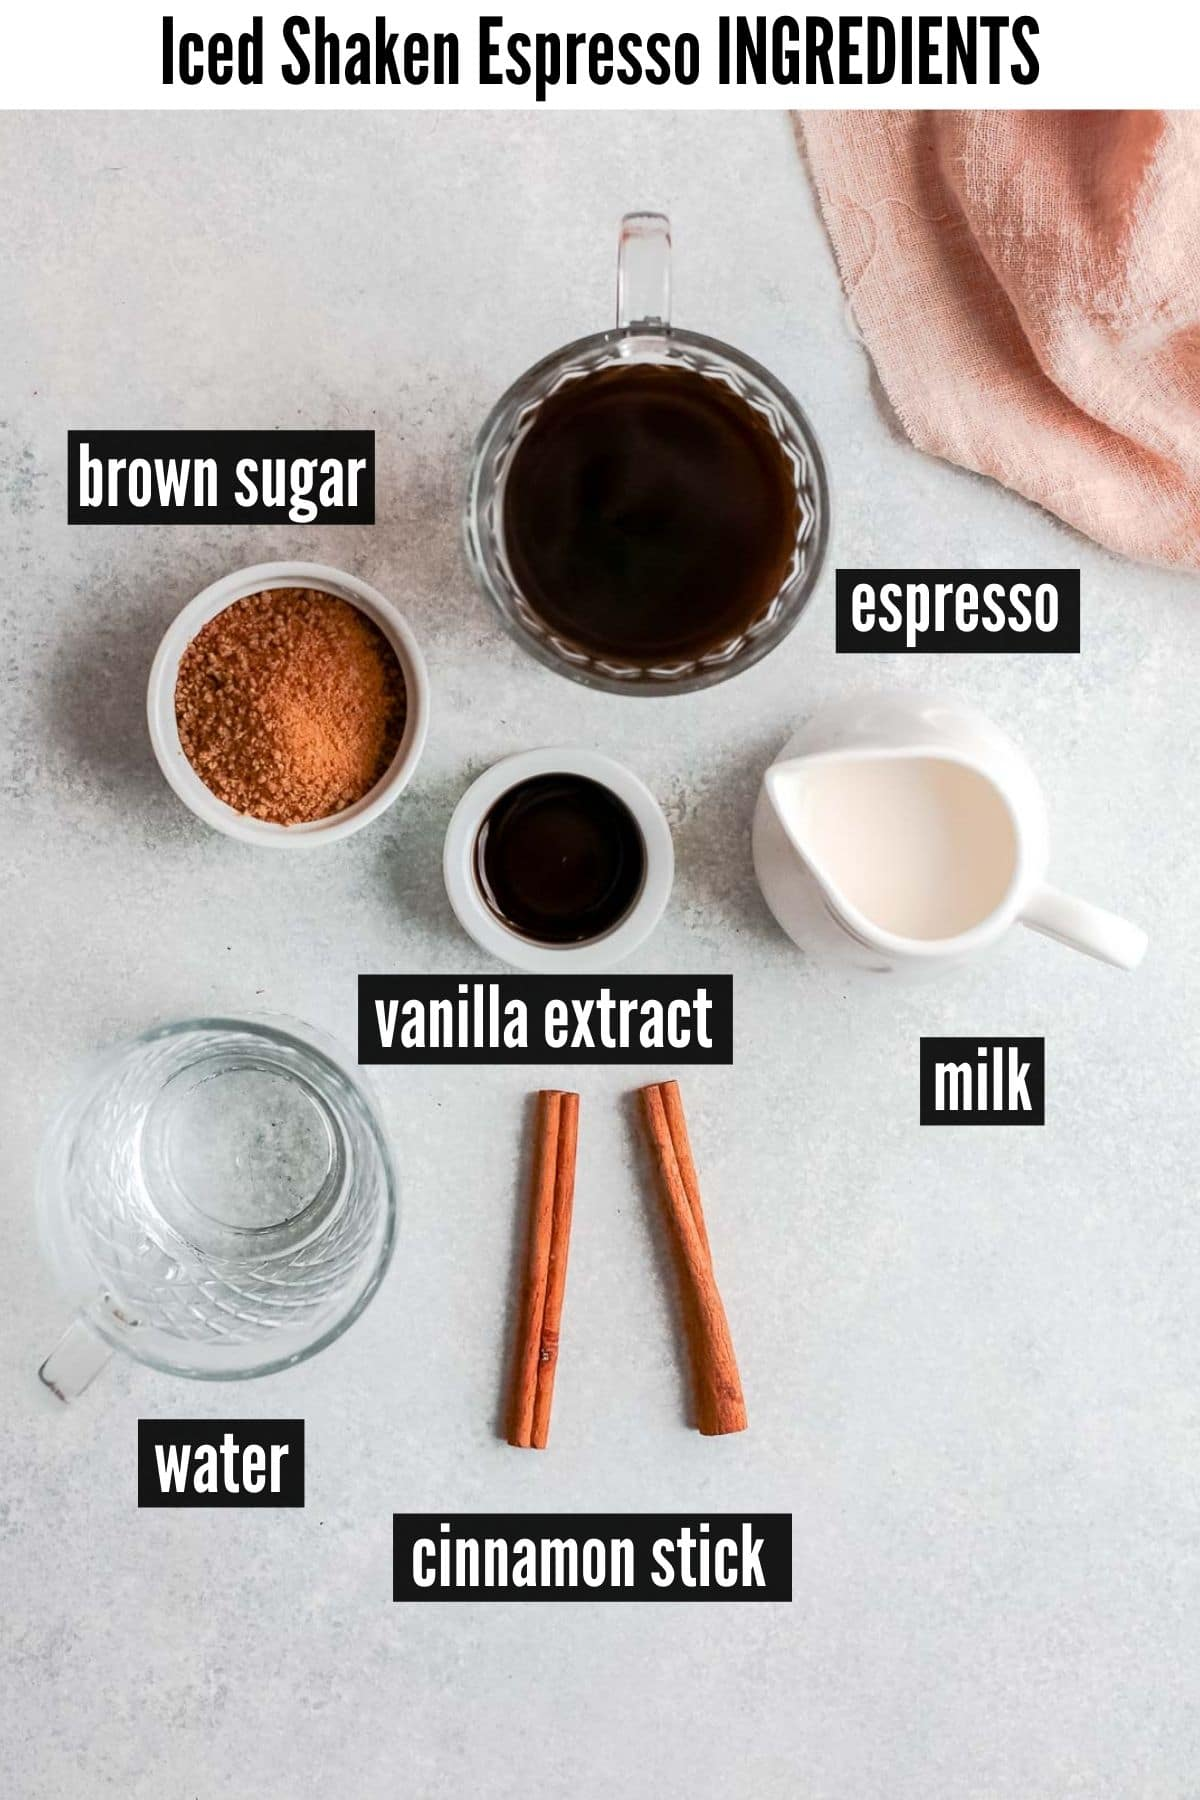 shaken espresso ingredients